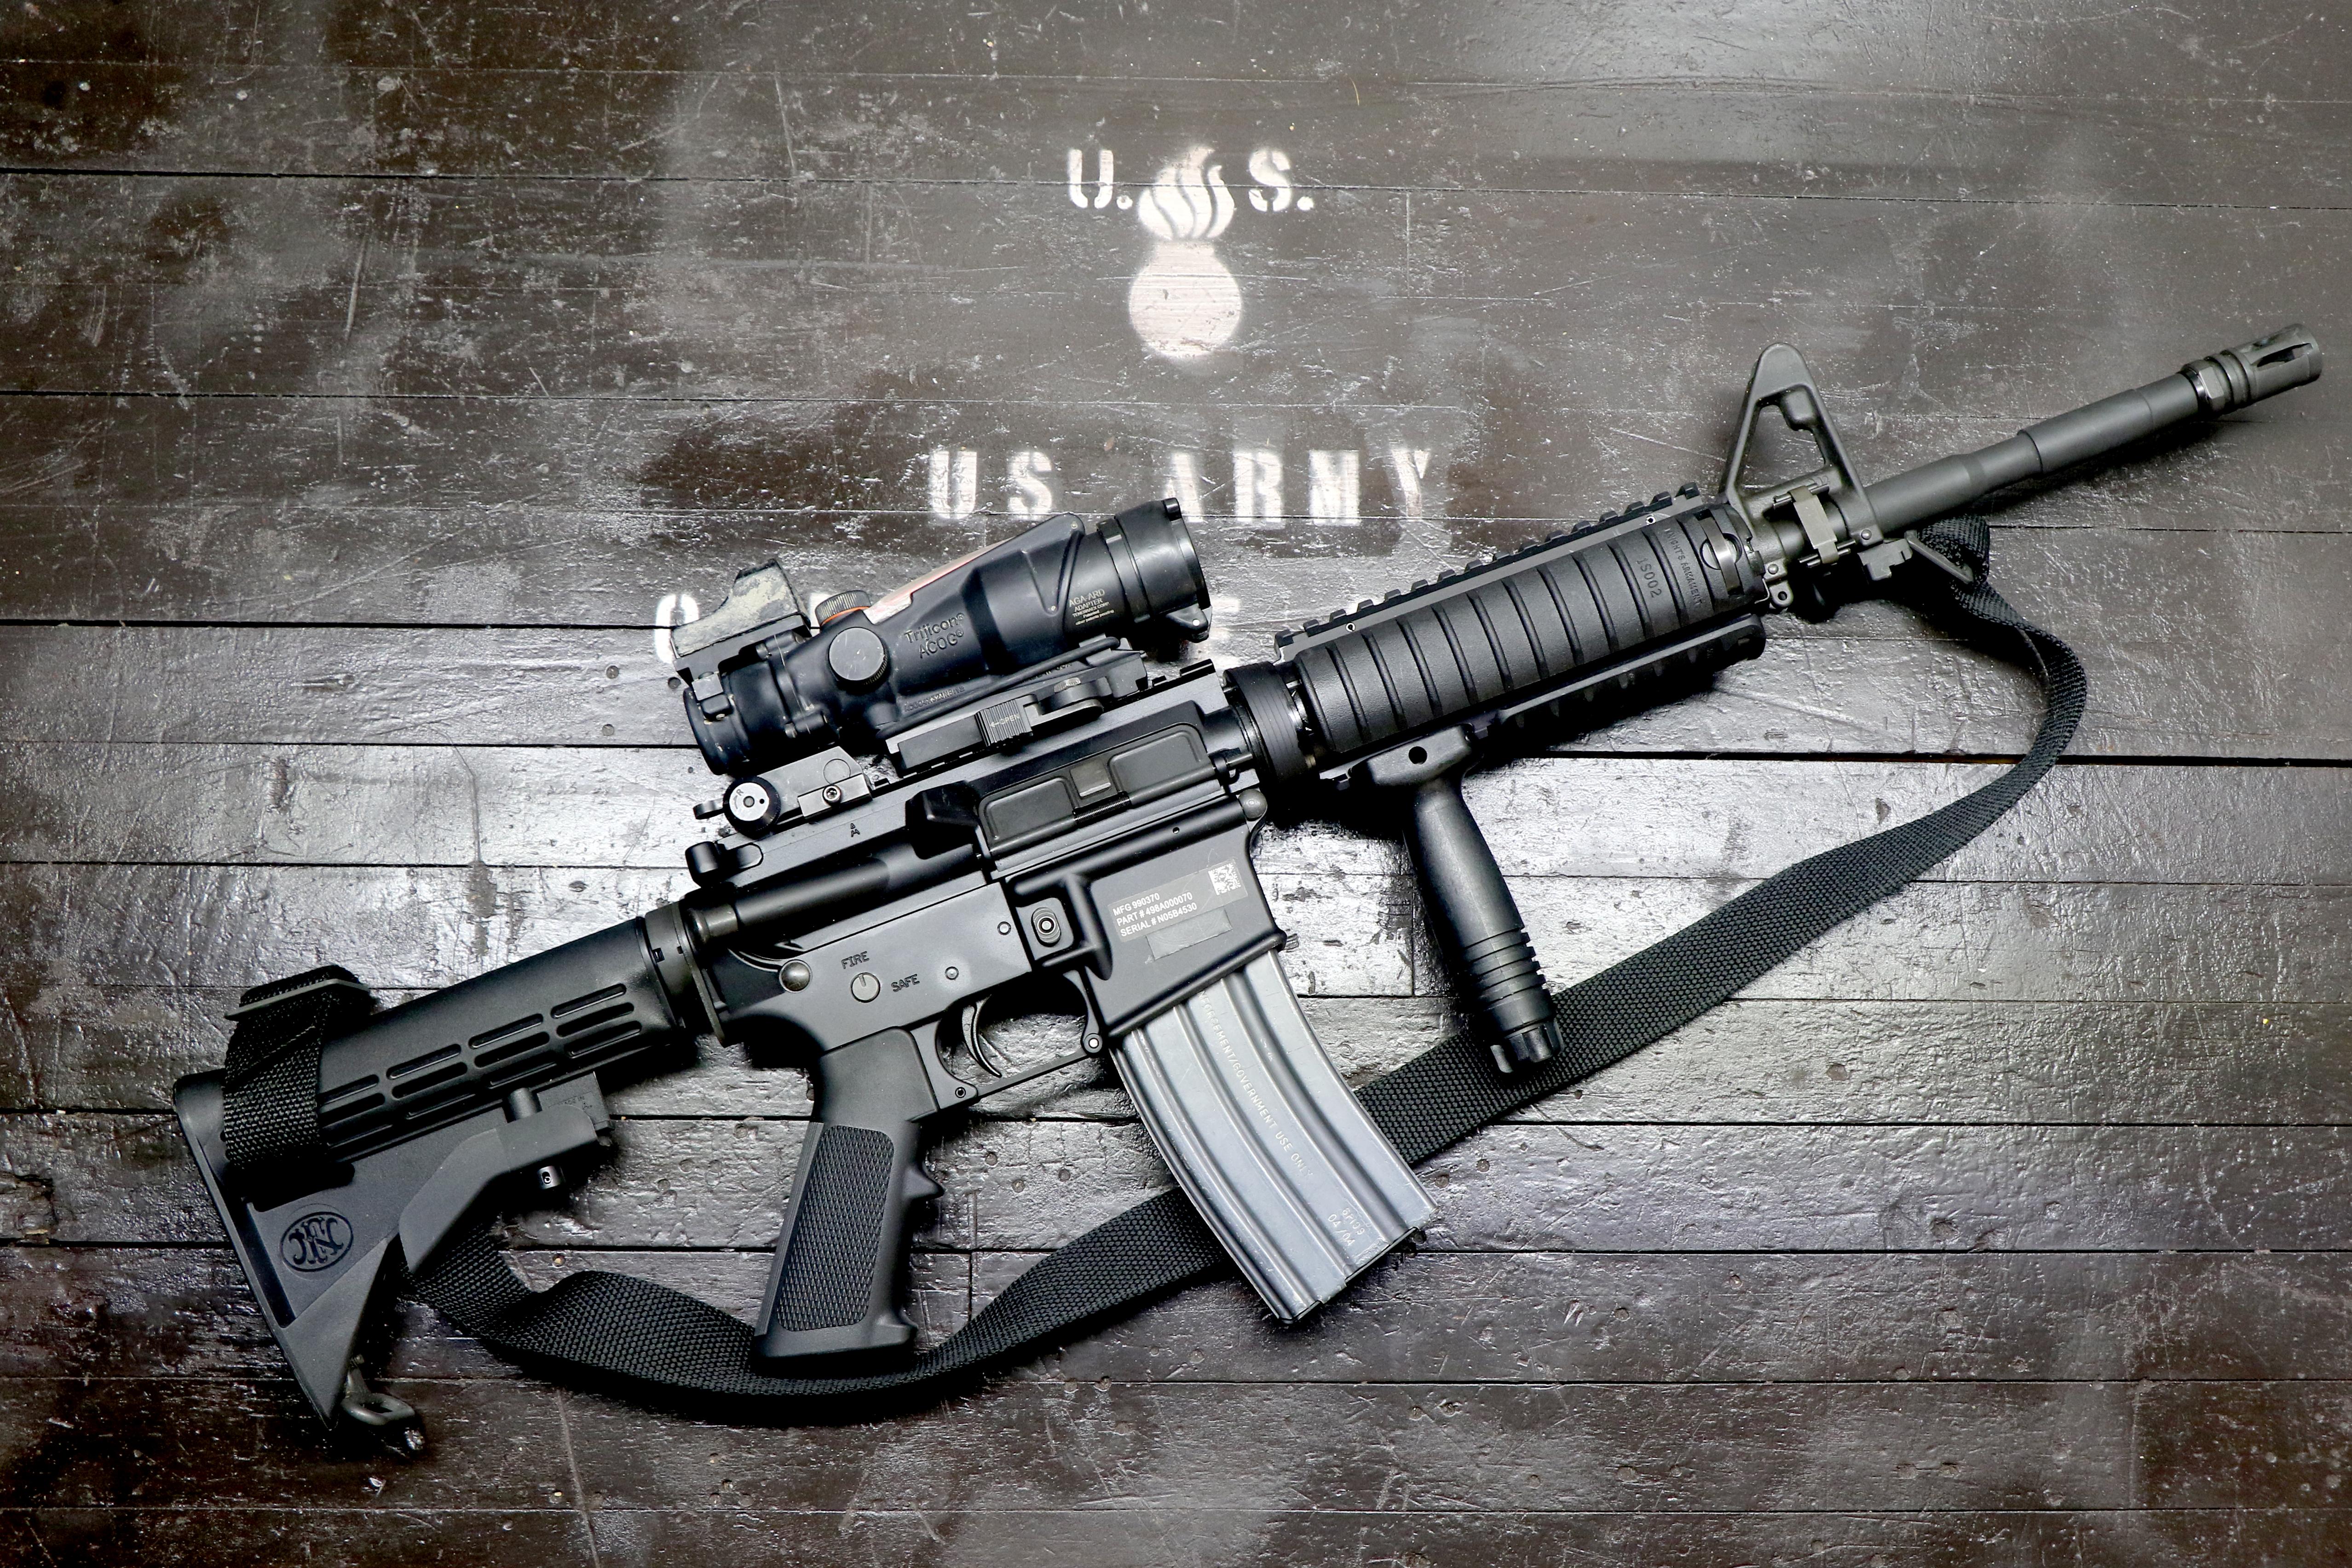 FN M4A1 Carbine